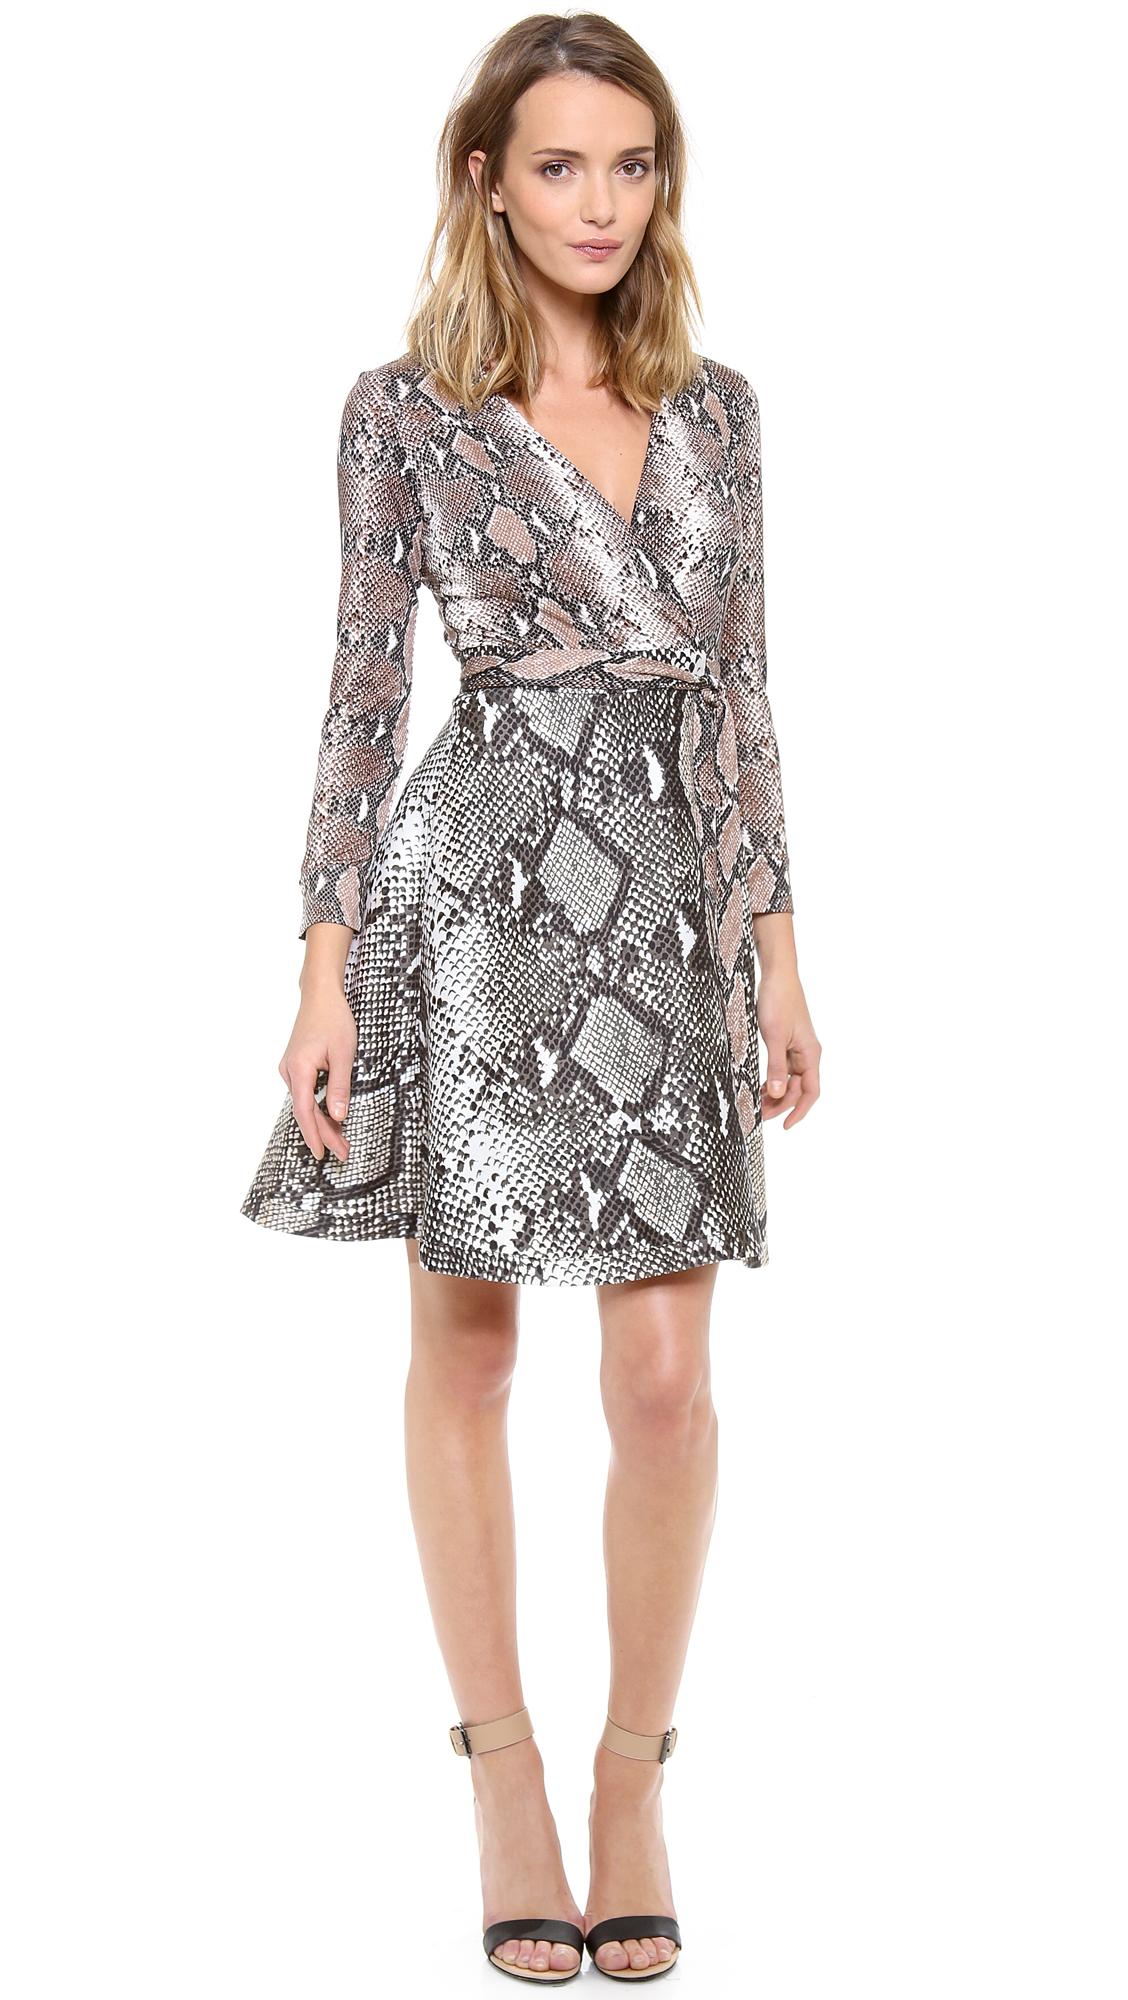 The wrap dress dvf - The Wrap Dress Dvf 36